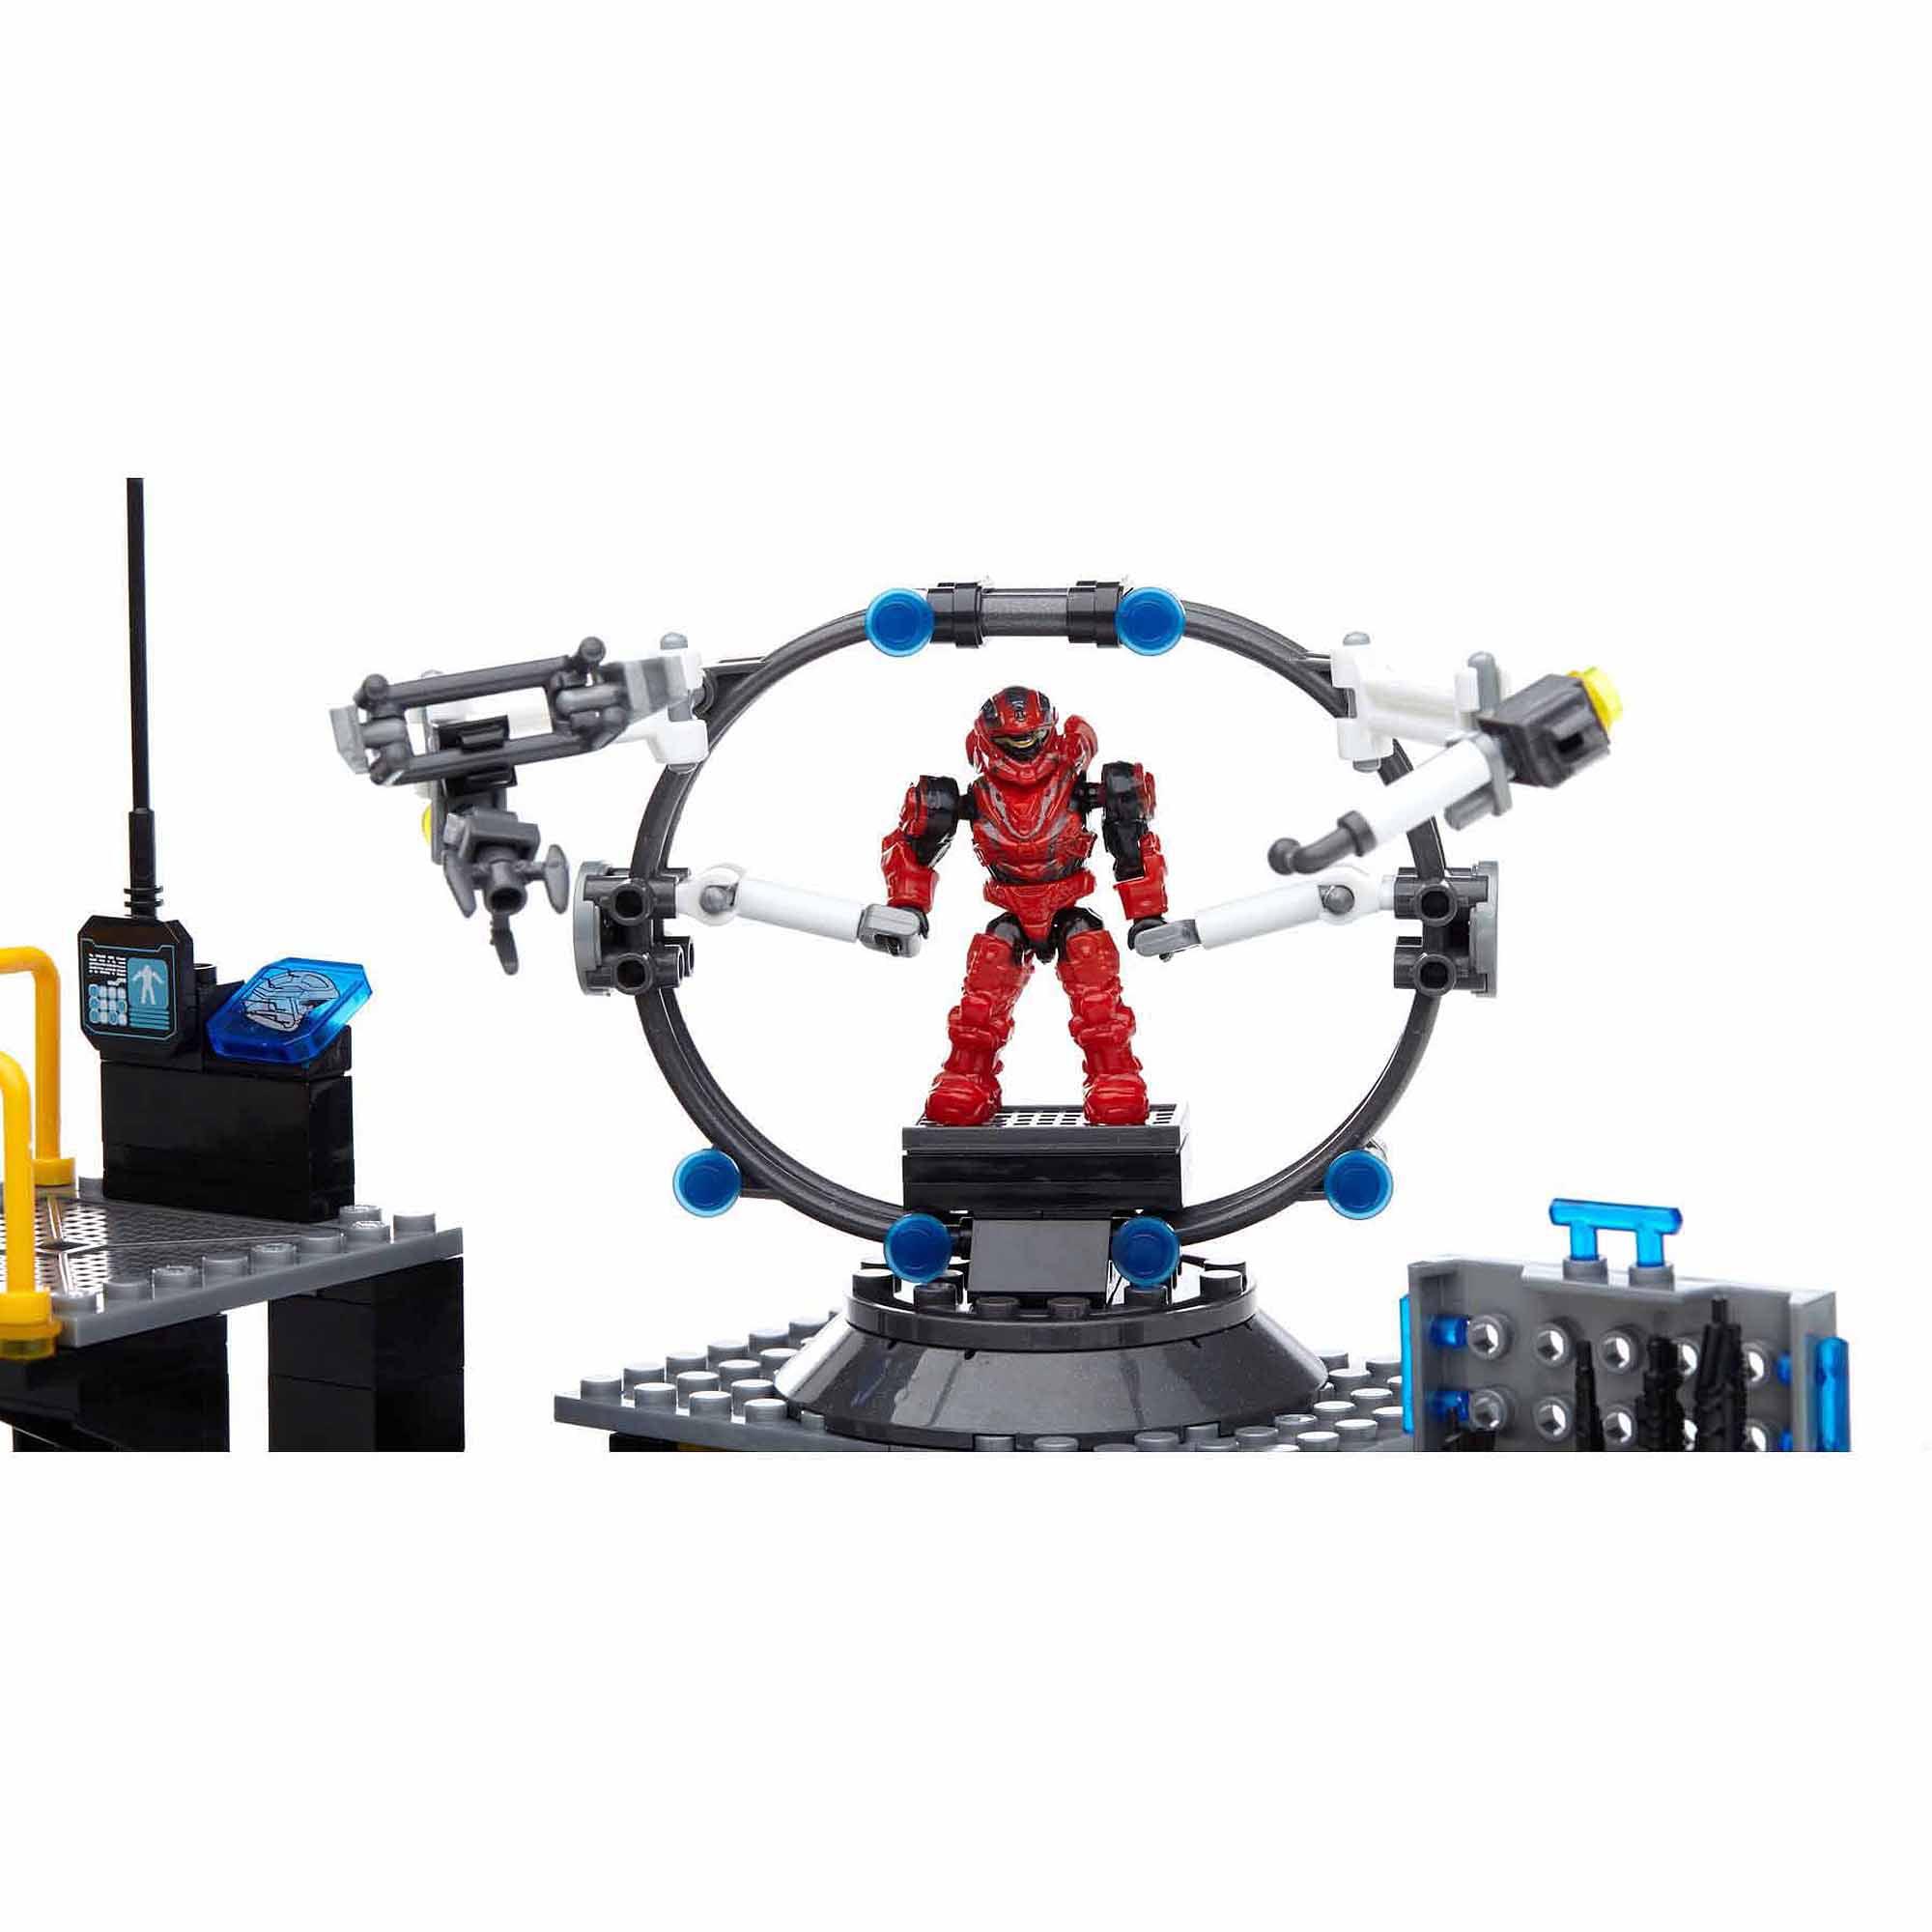 Mega Bloks Halo UNSC Infinity Armor Bay by